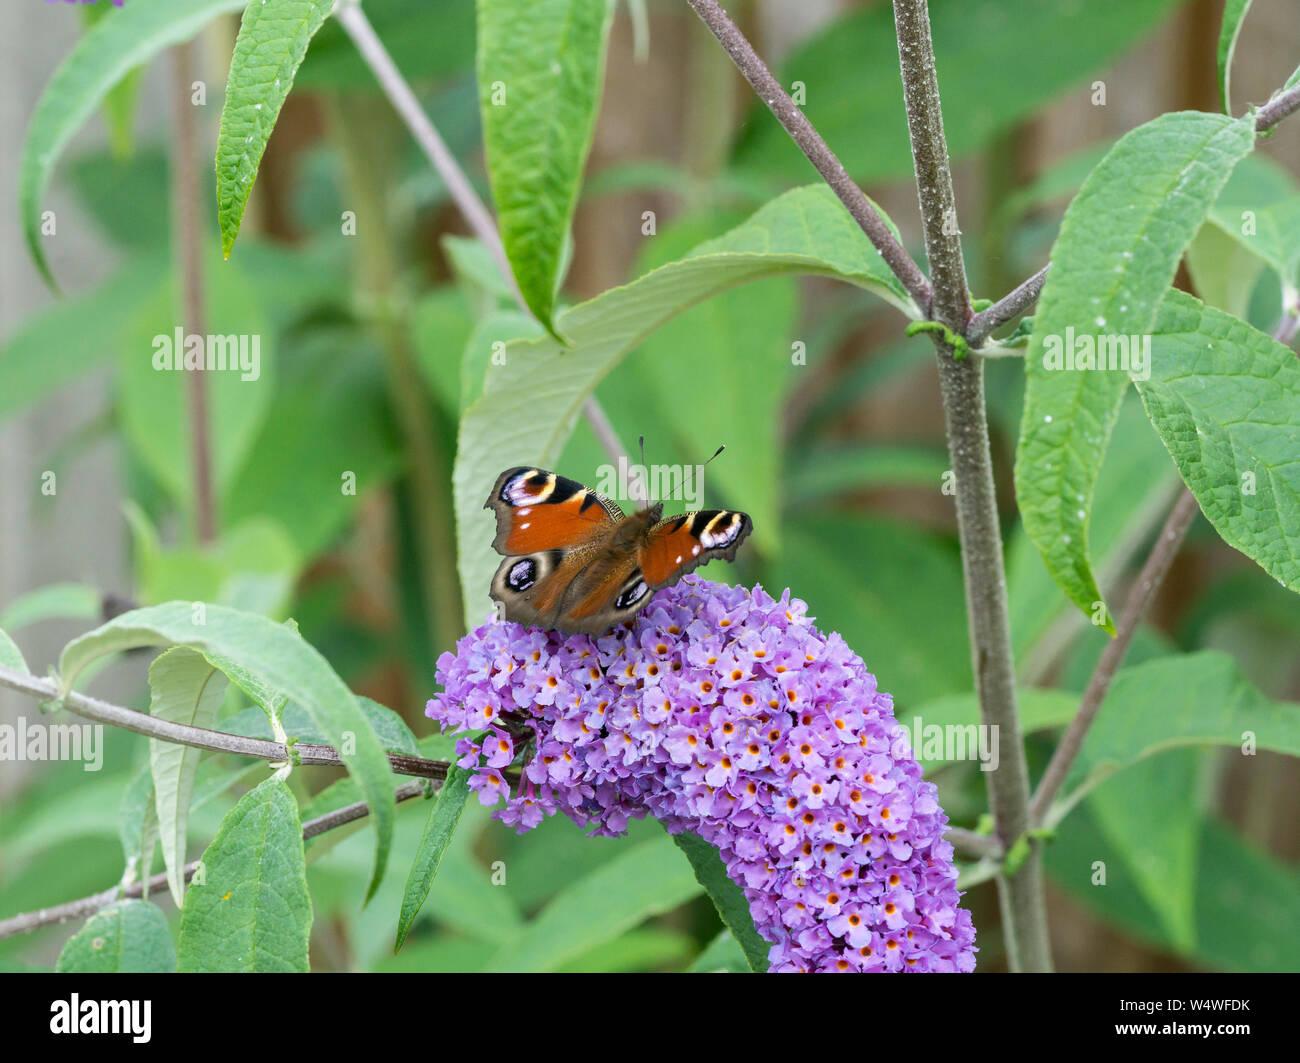 peacock-butterfly-feeding-on-blossom-of-buddleja-bush-W4WFDK.jpg